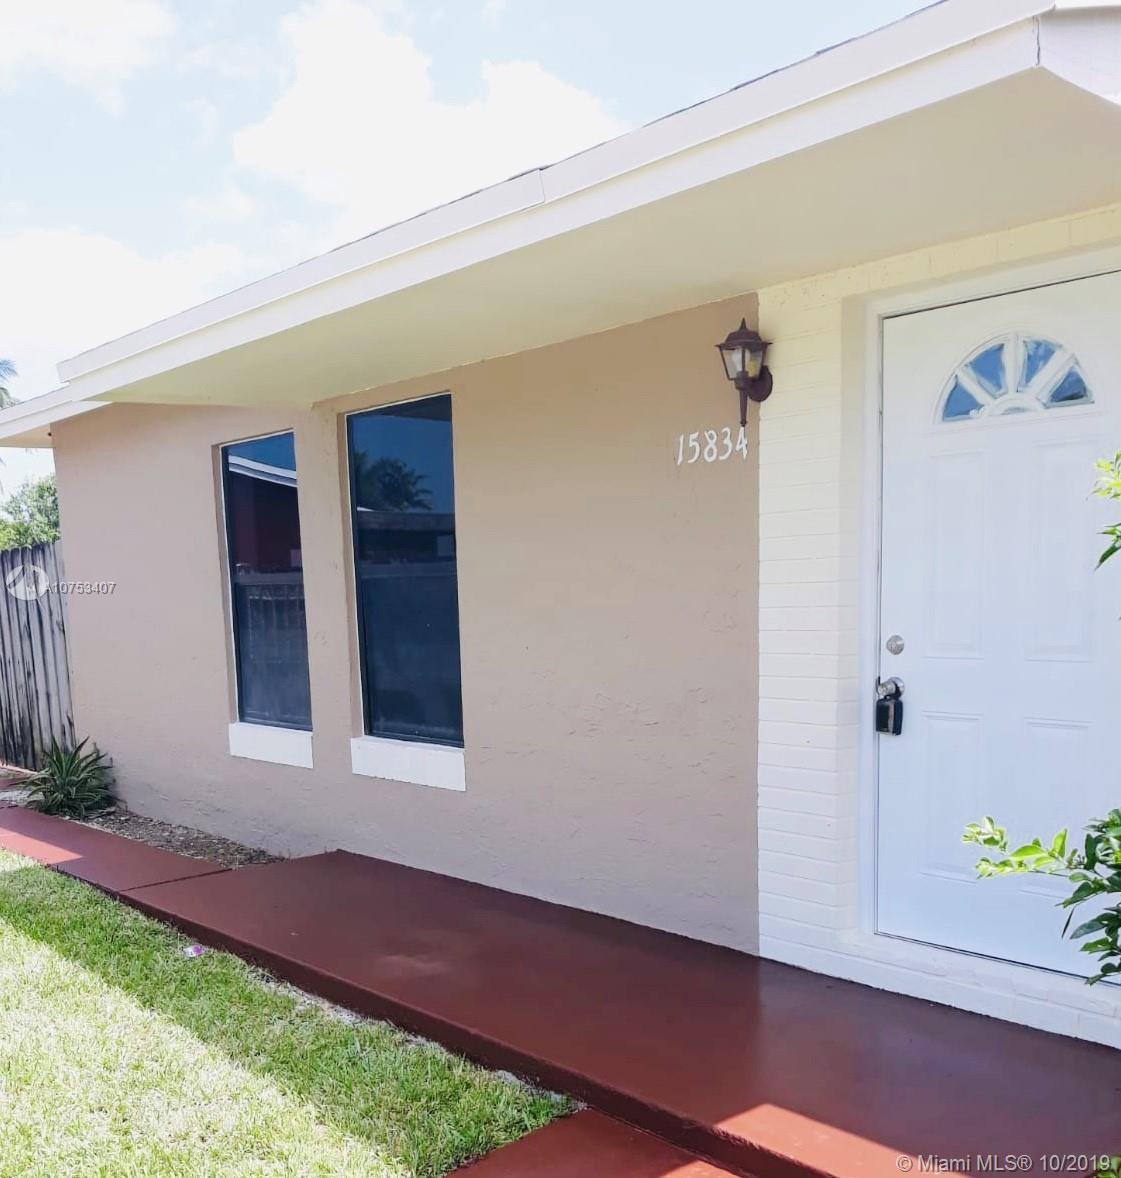 15834 305 TER, Homestead, FL 33033 - Homestead, FL real estate listing